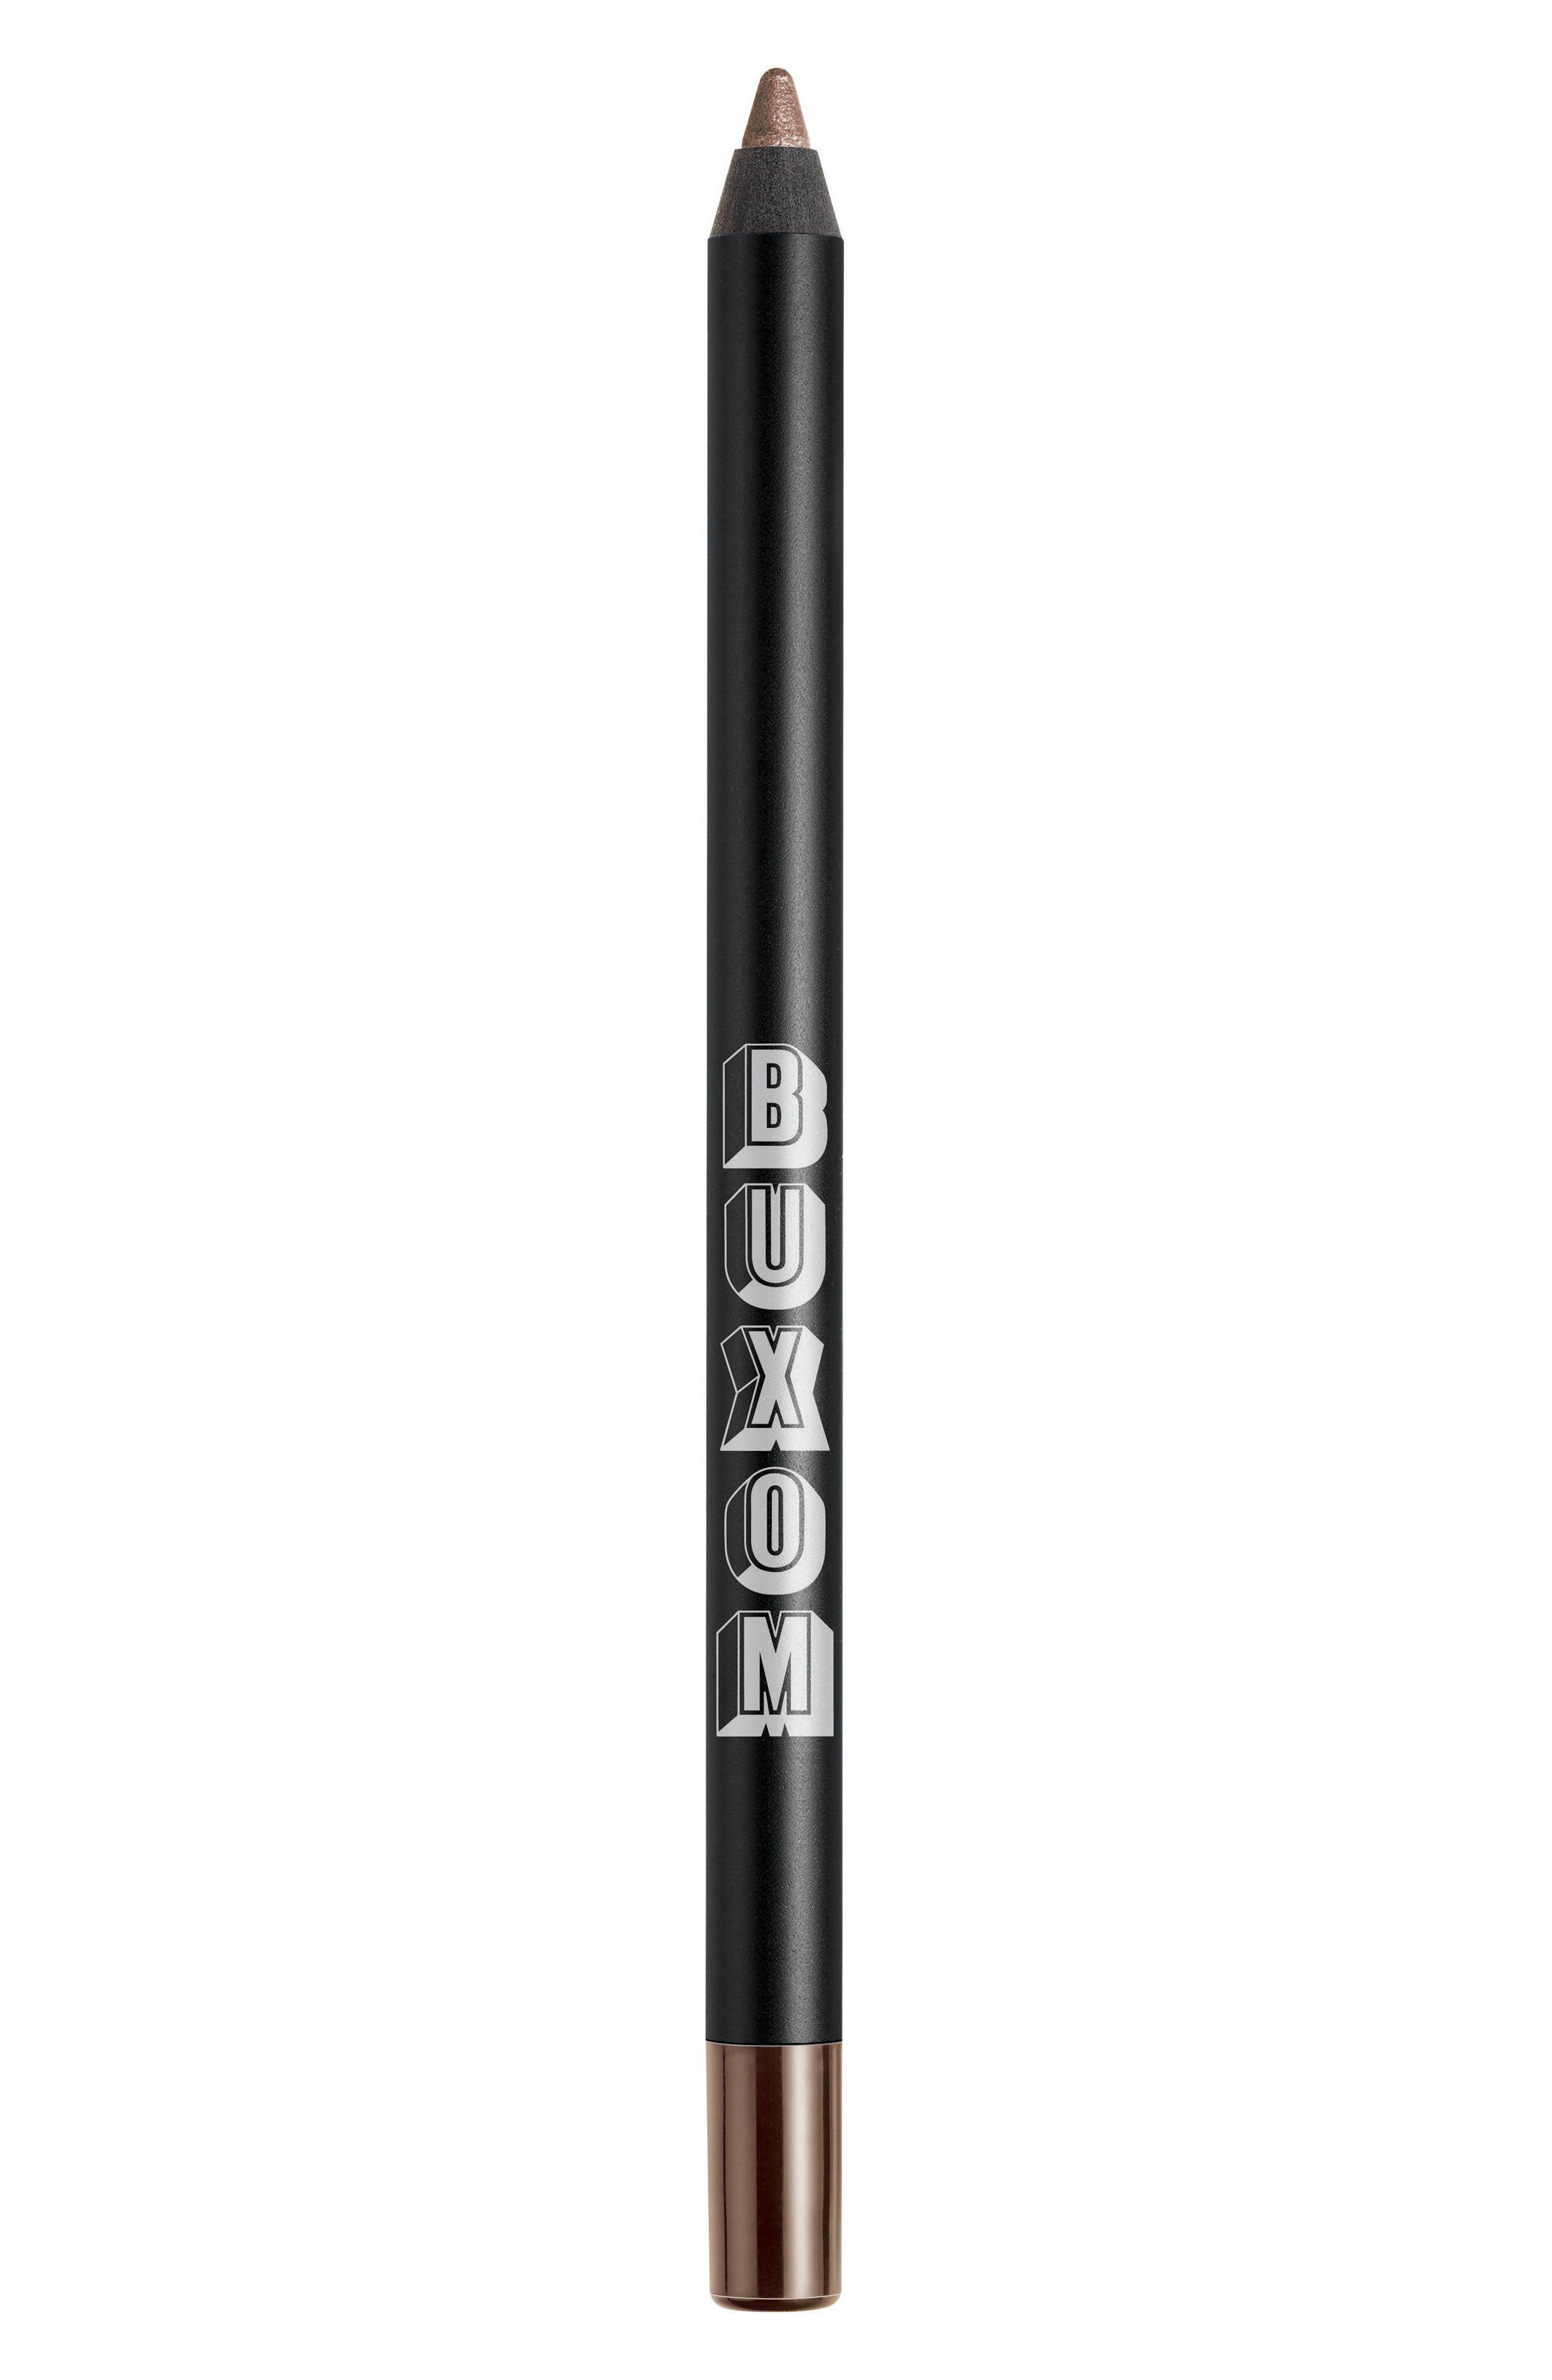 Buxom Hold The Line Waterproof Eyeliner - Knock Twice